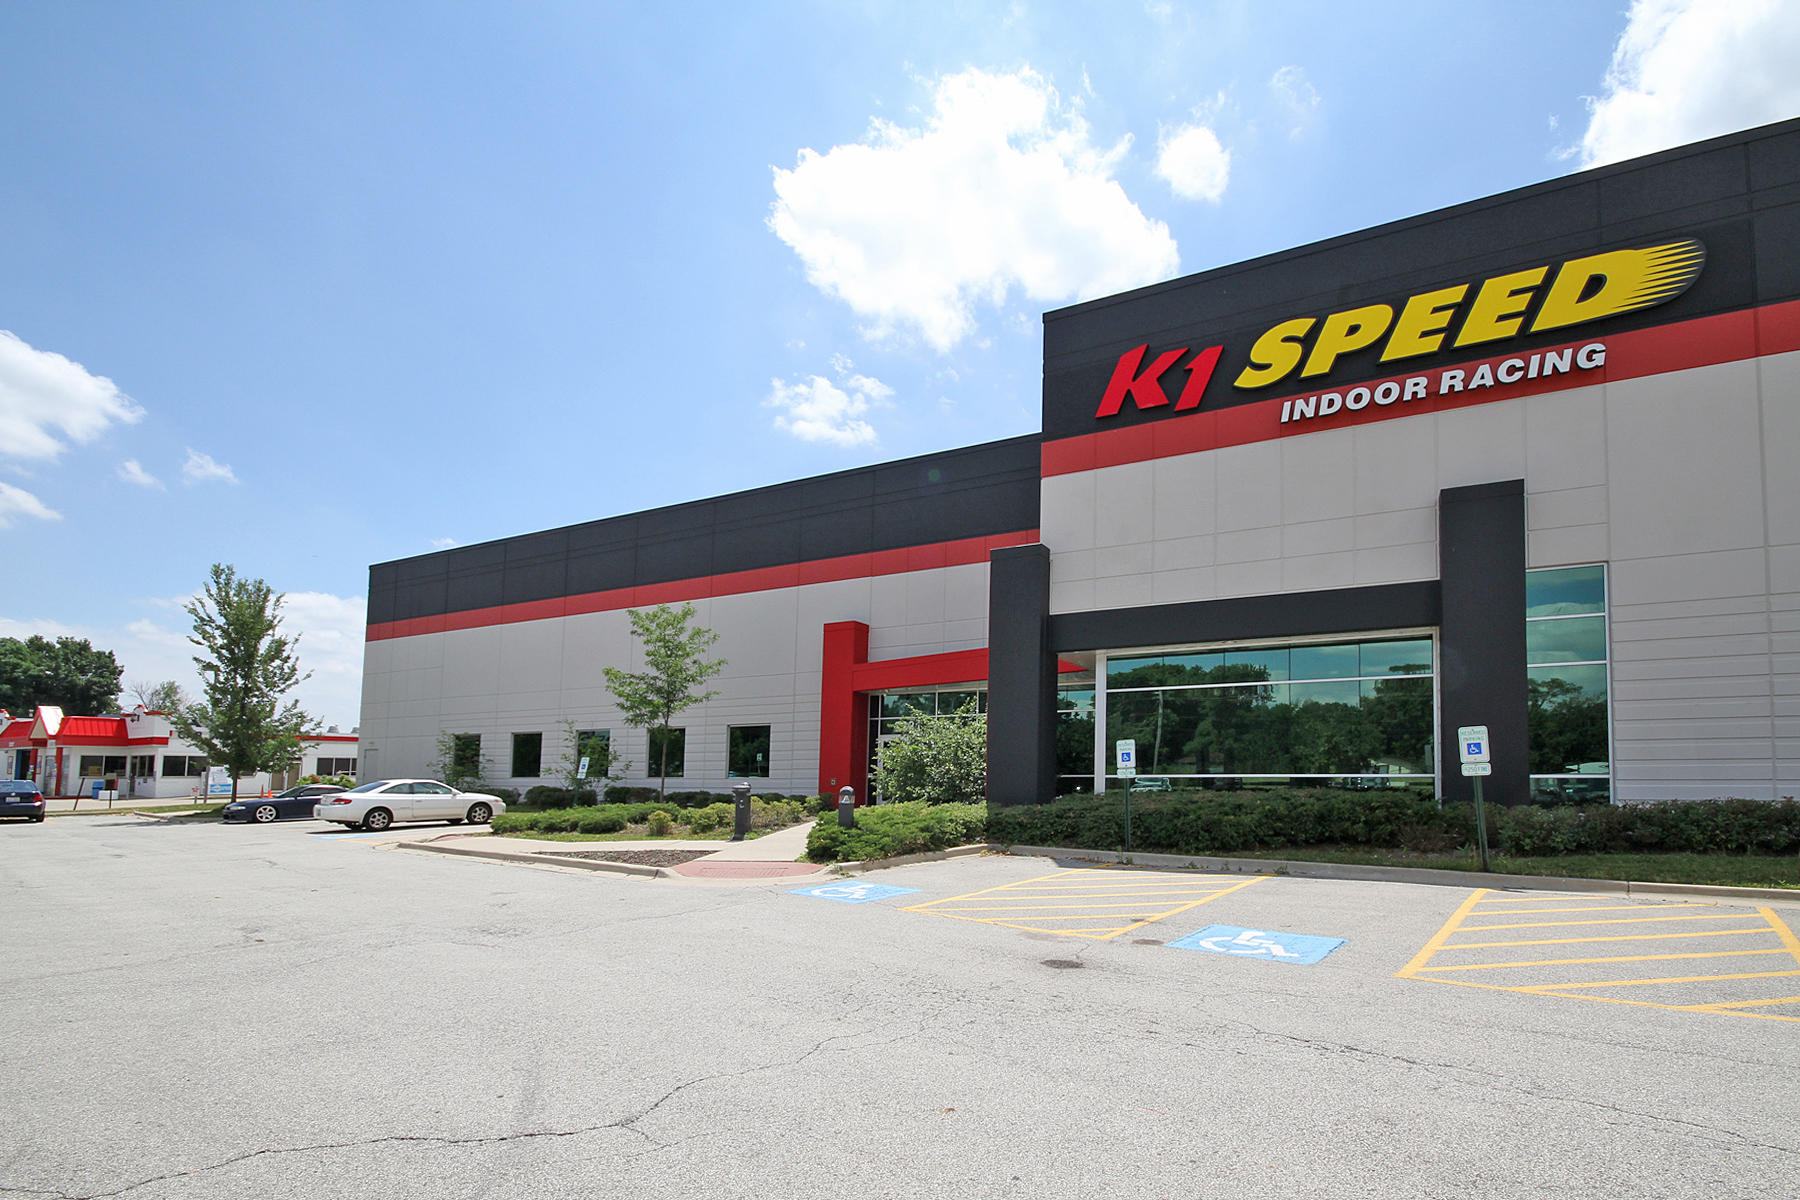 K1 Speed image 10